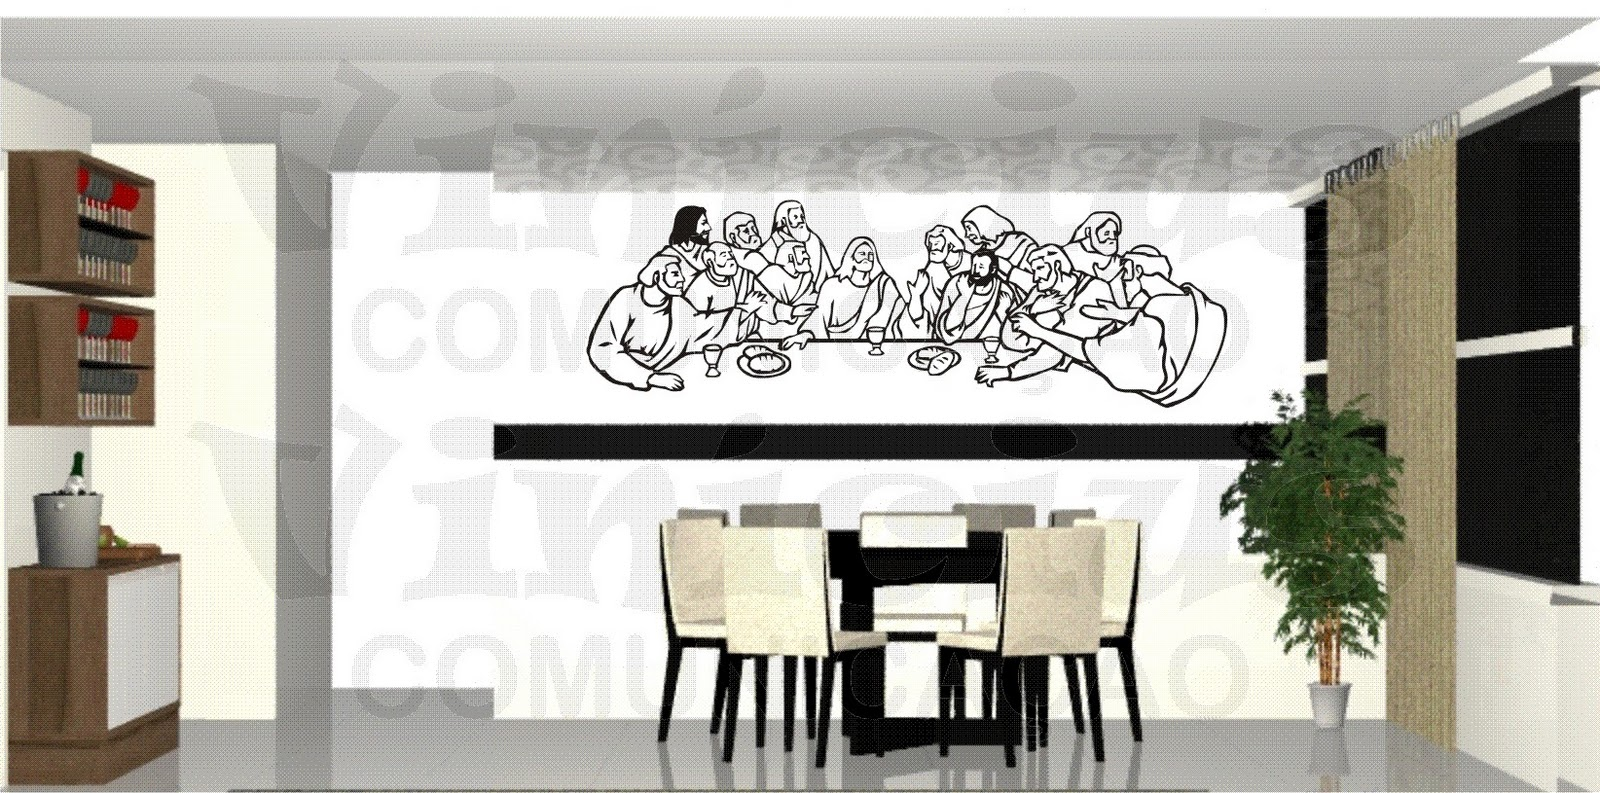 Vin Cius Comunica O Sala De Jantar Santa Ceia  -> Adesivos Decorativos Para Sala De Jantar